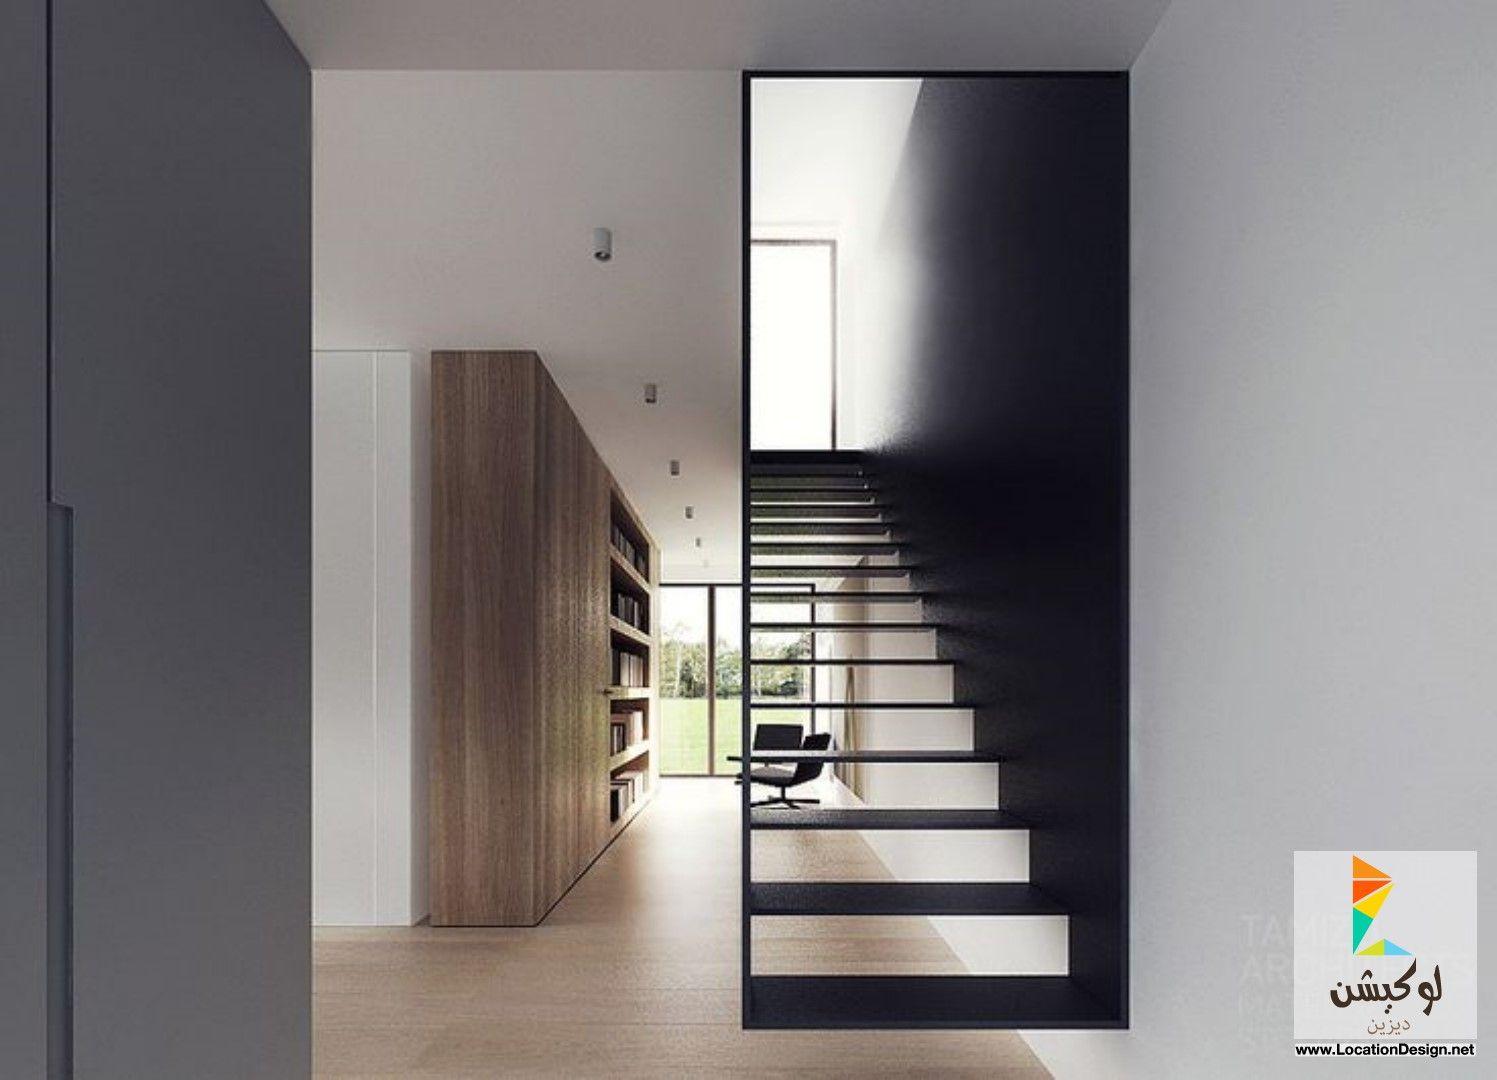 ديكورات سلالم حديد مودرن Design De Escada Remodelacao Casas Luxuosas